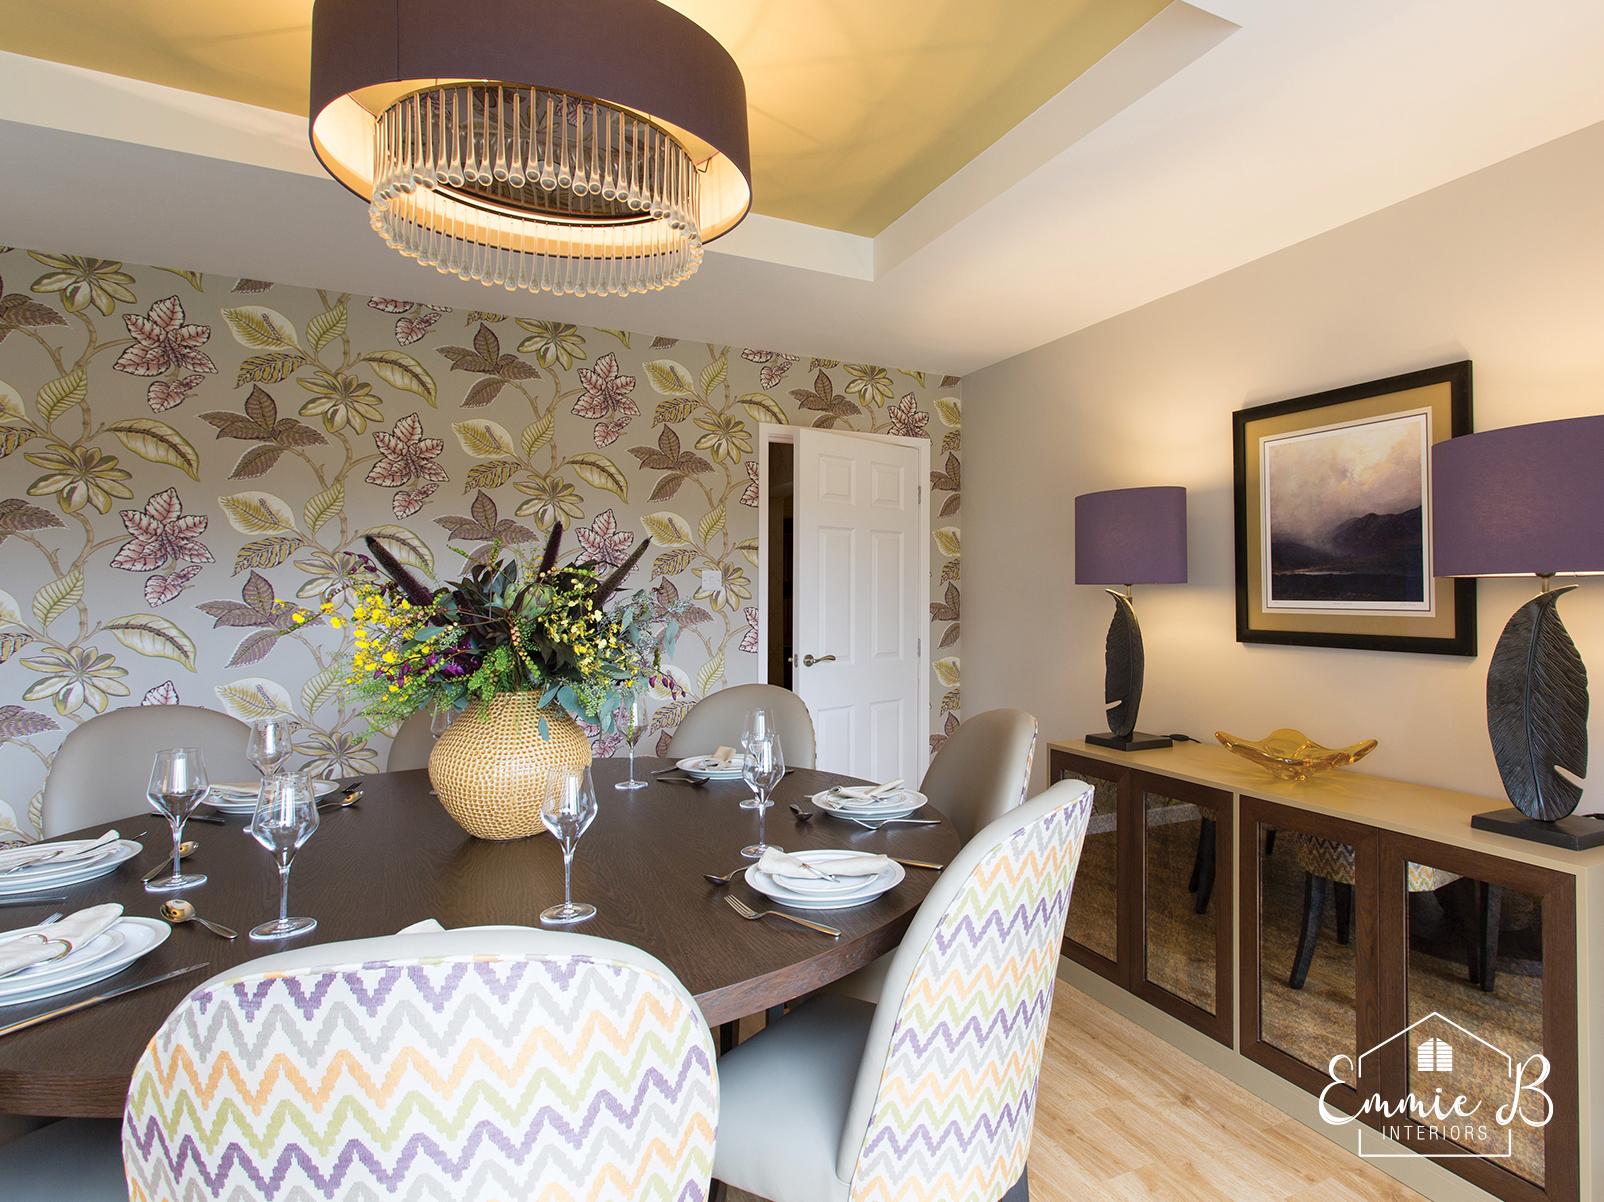 Dining Room Interior Design Cheshire